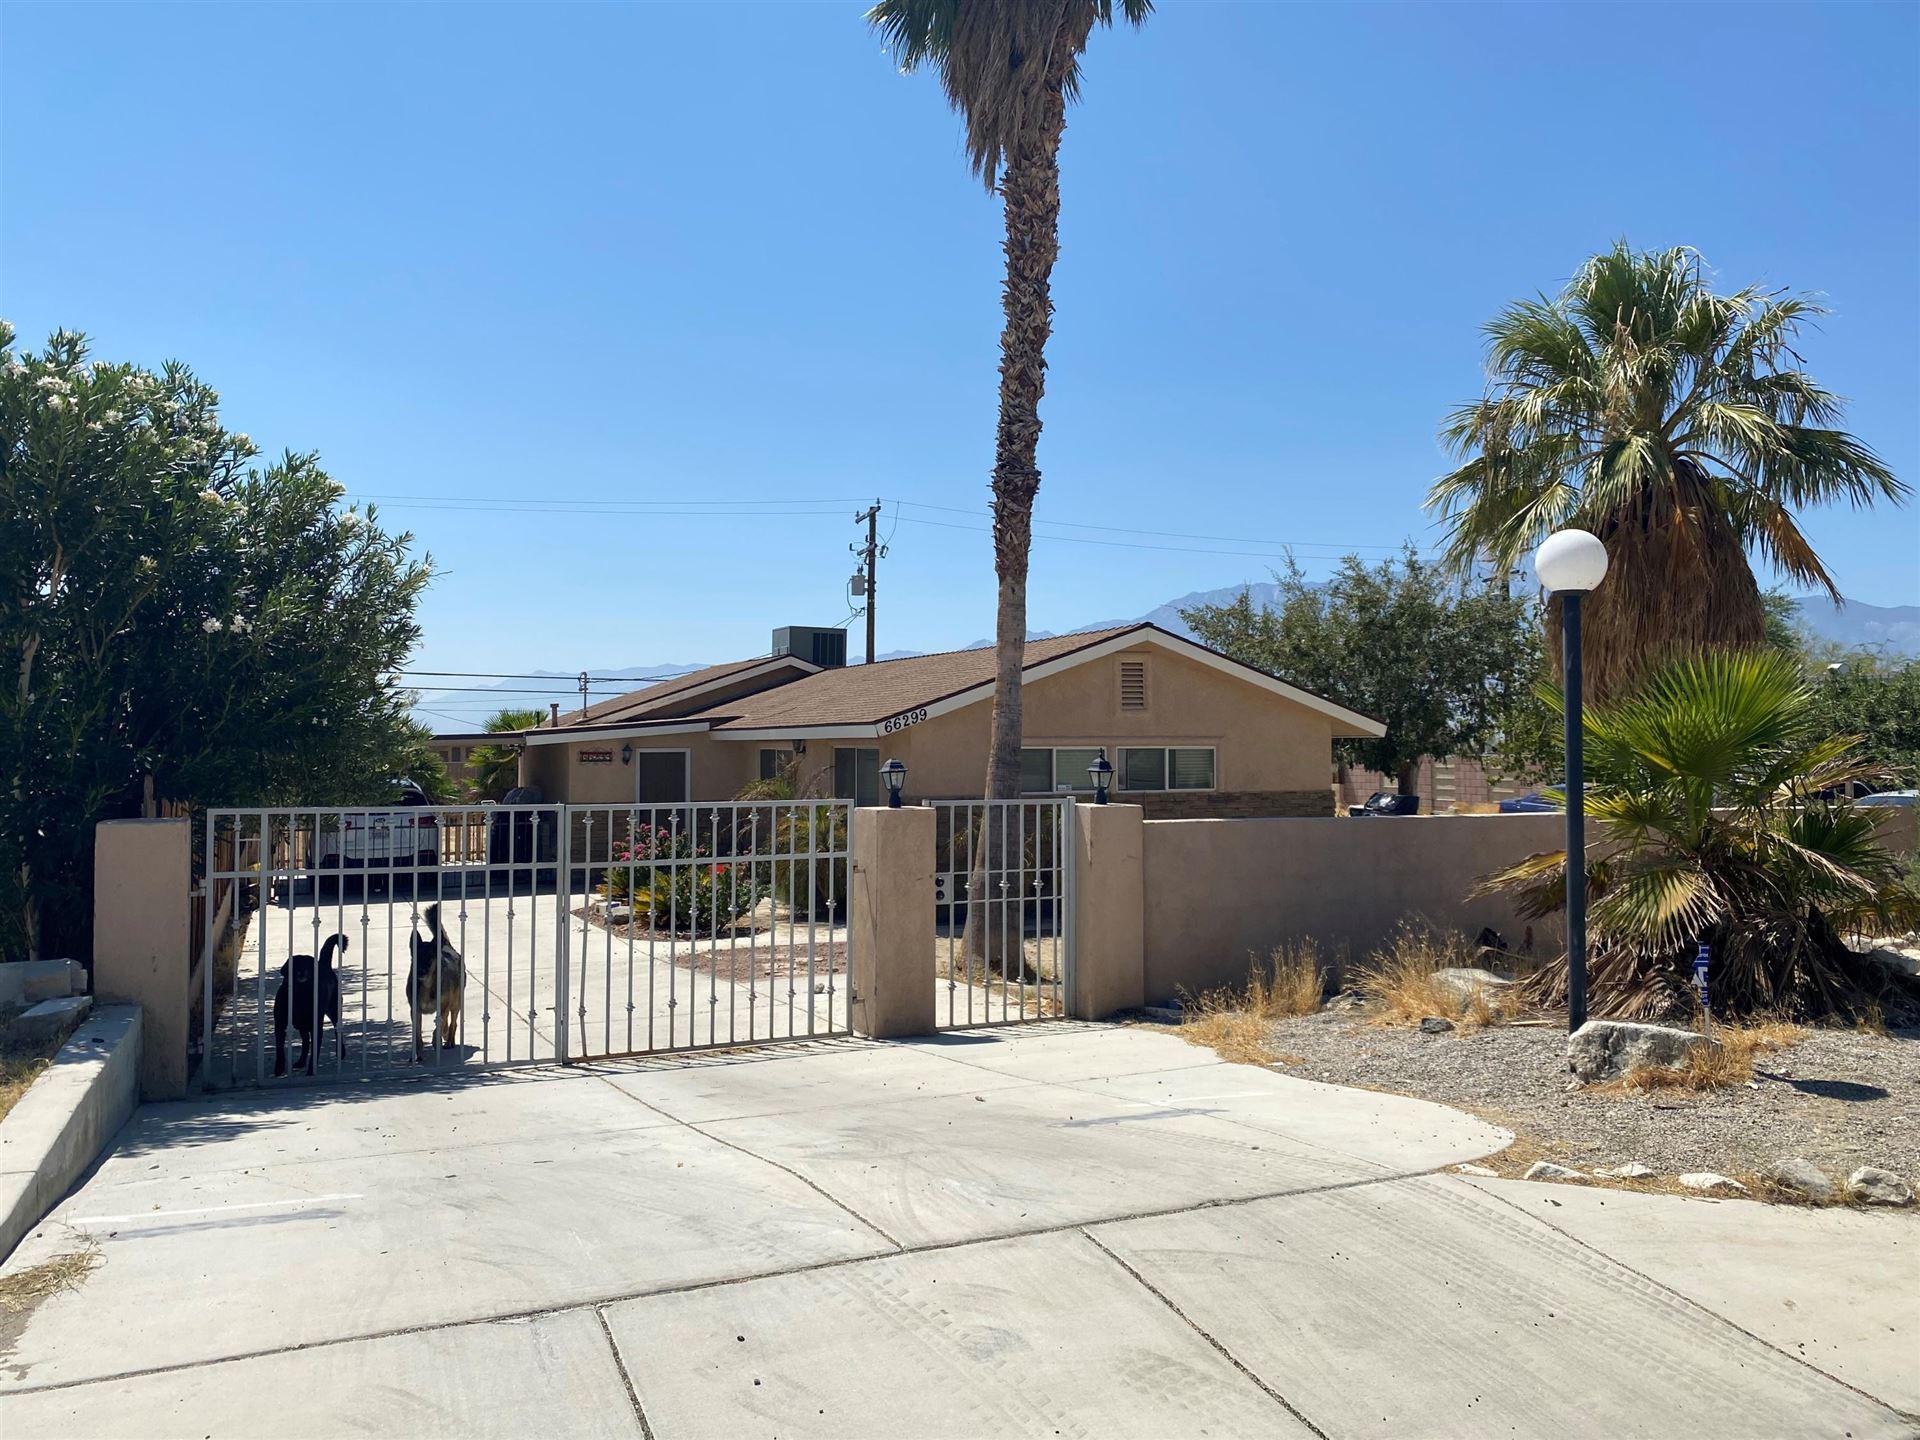 66299 8th Street, Desert Hot Springs, CA 92240 - MLS#: 219048635